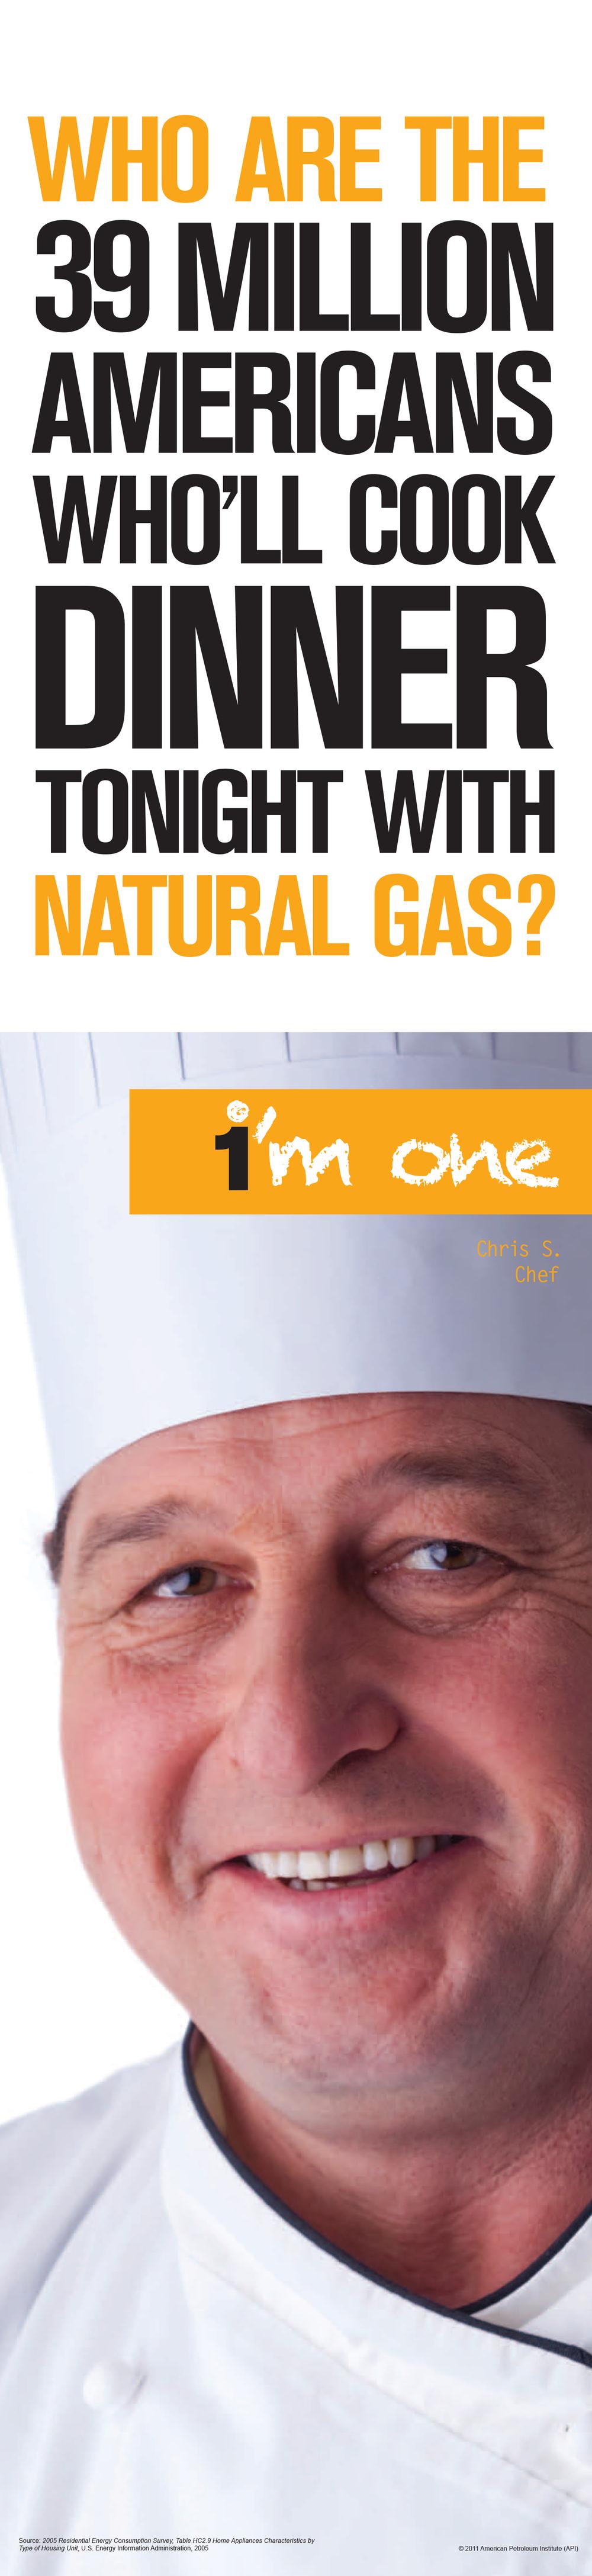 API 'Im One' POLES 12-7-10-3.jpg